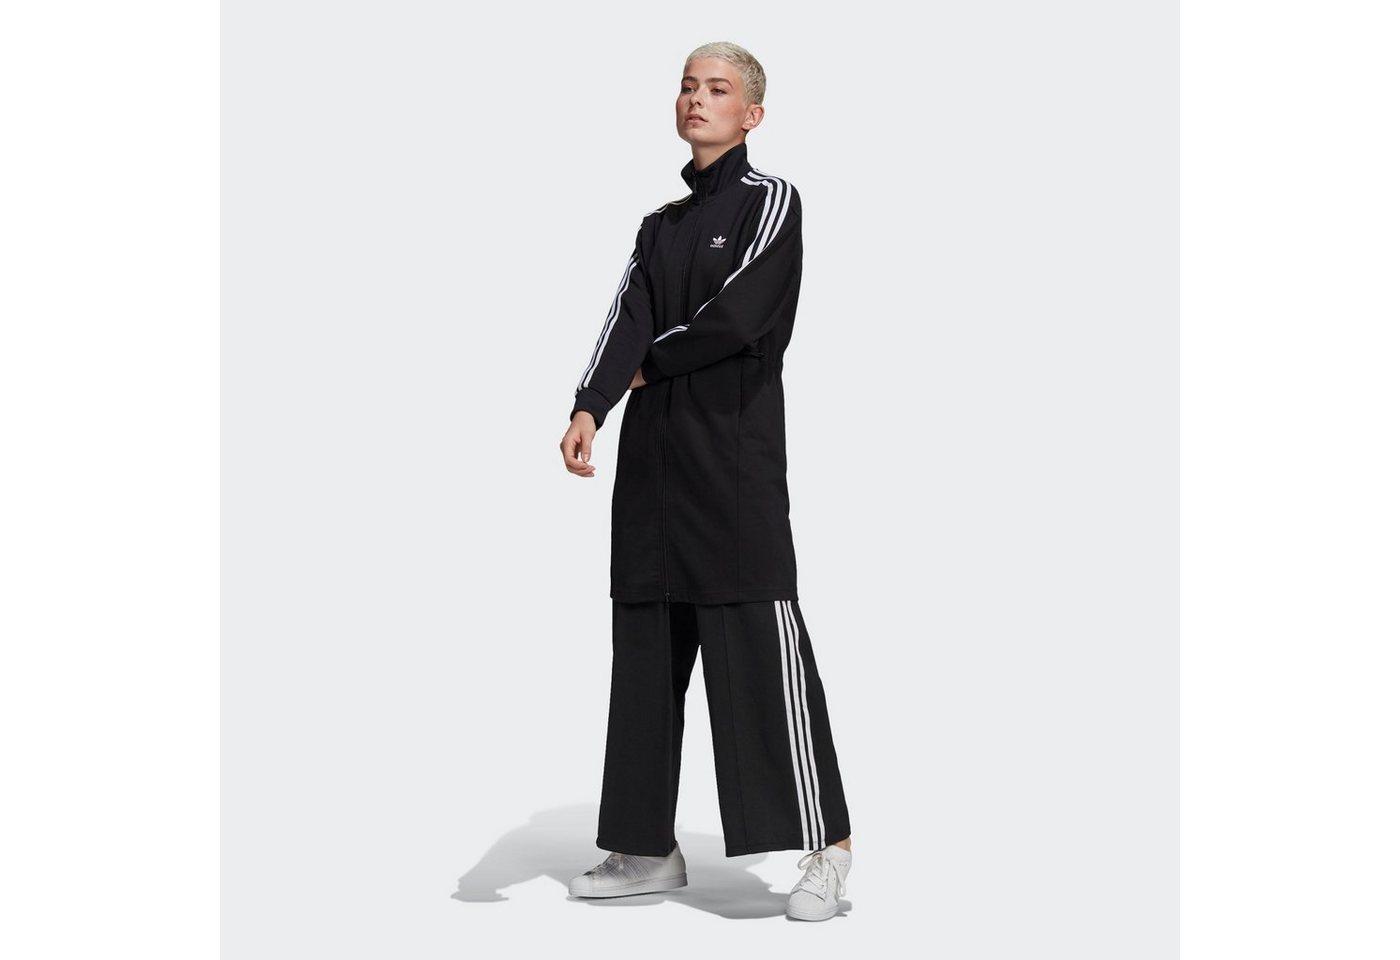 Sportmode - adidas Originals Trainingsanzug »Adicolor Classics Primeblue Long Originals Jacke« ›  - Onlineshop OTTO